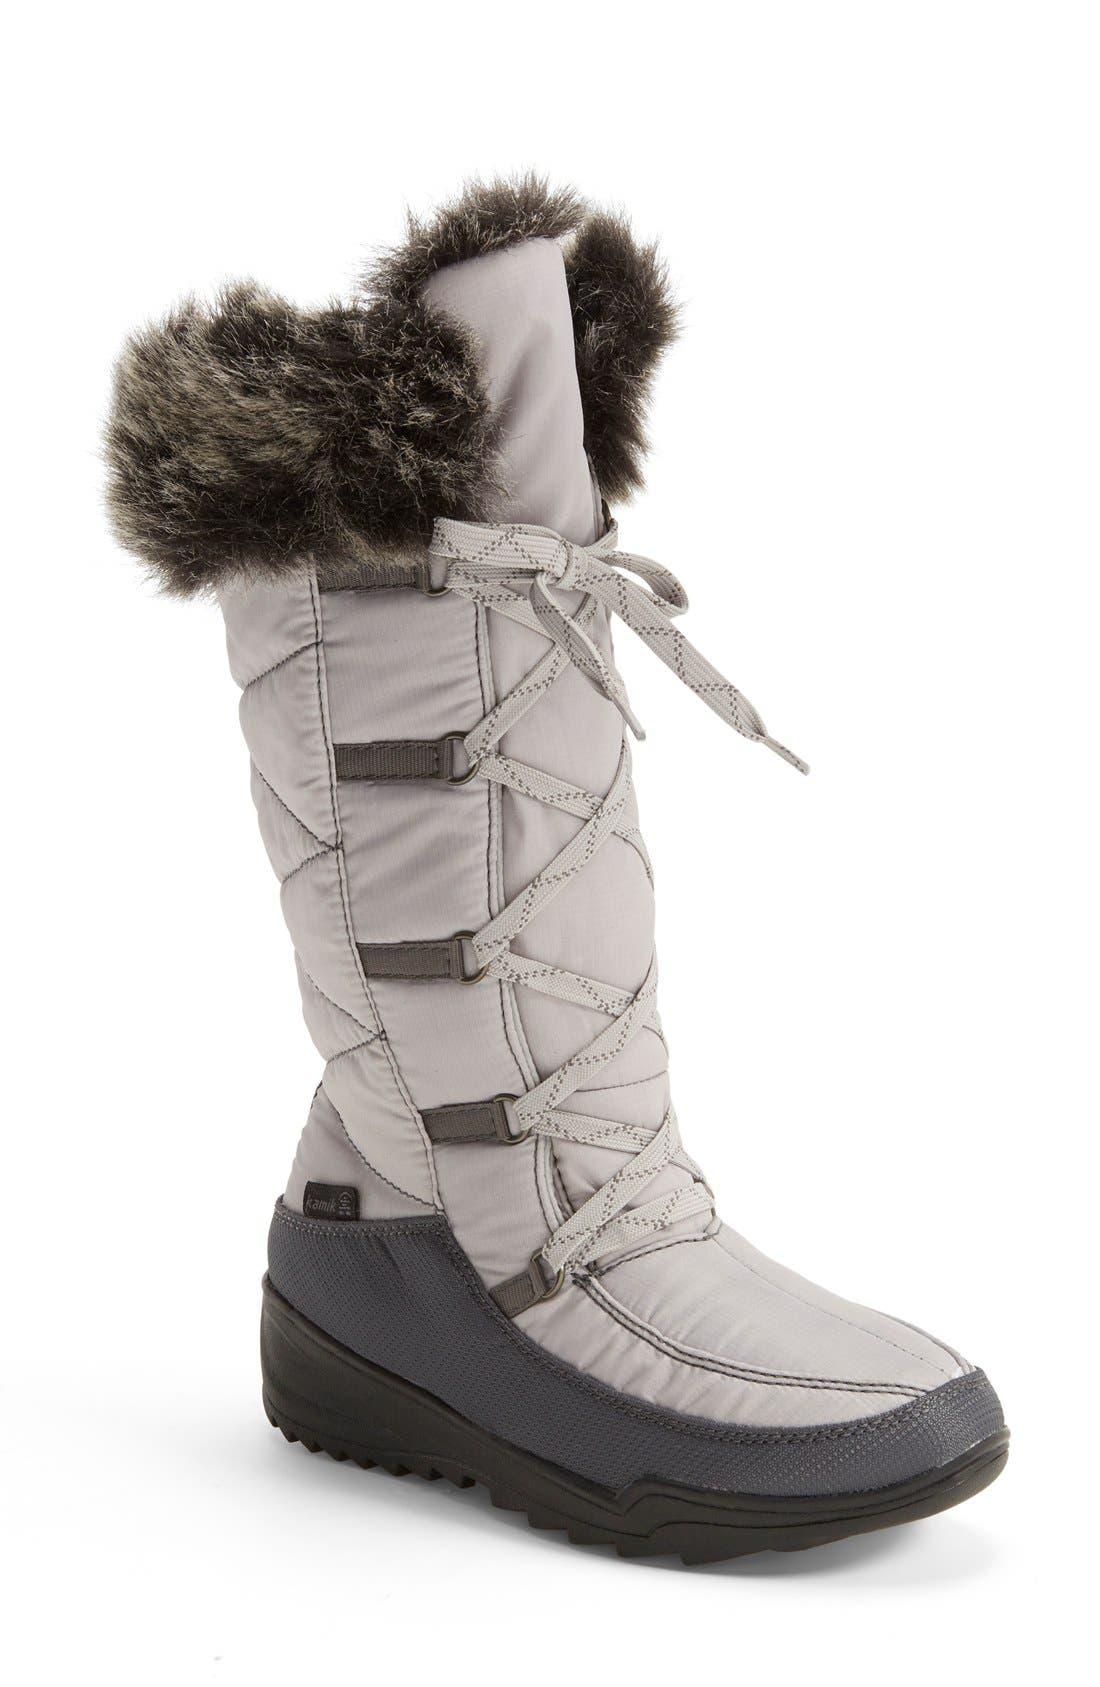 Main Image - Kamik 'Porto' Waterproof Winter Boot (Women)